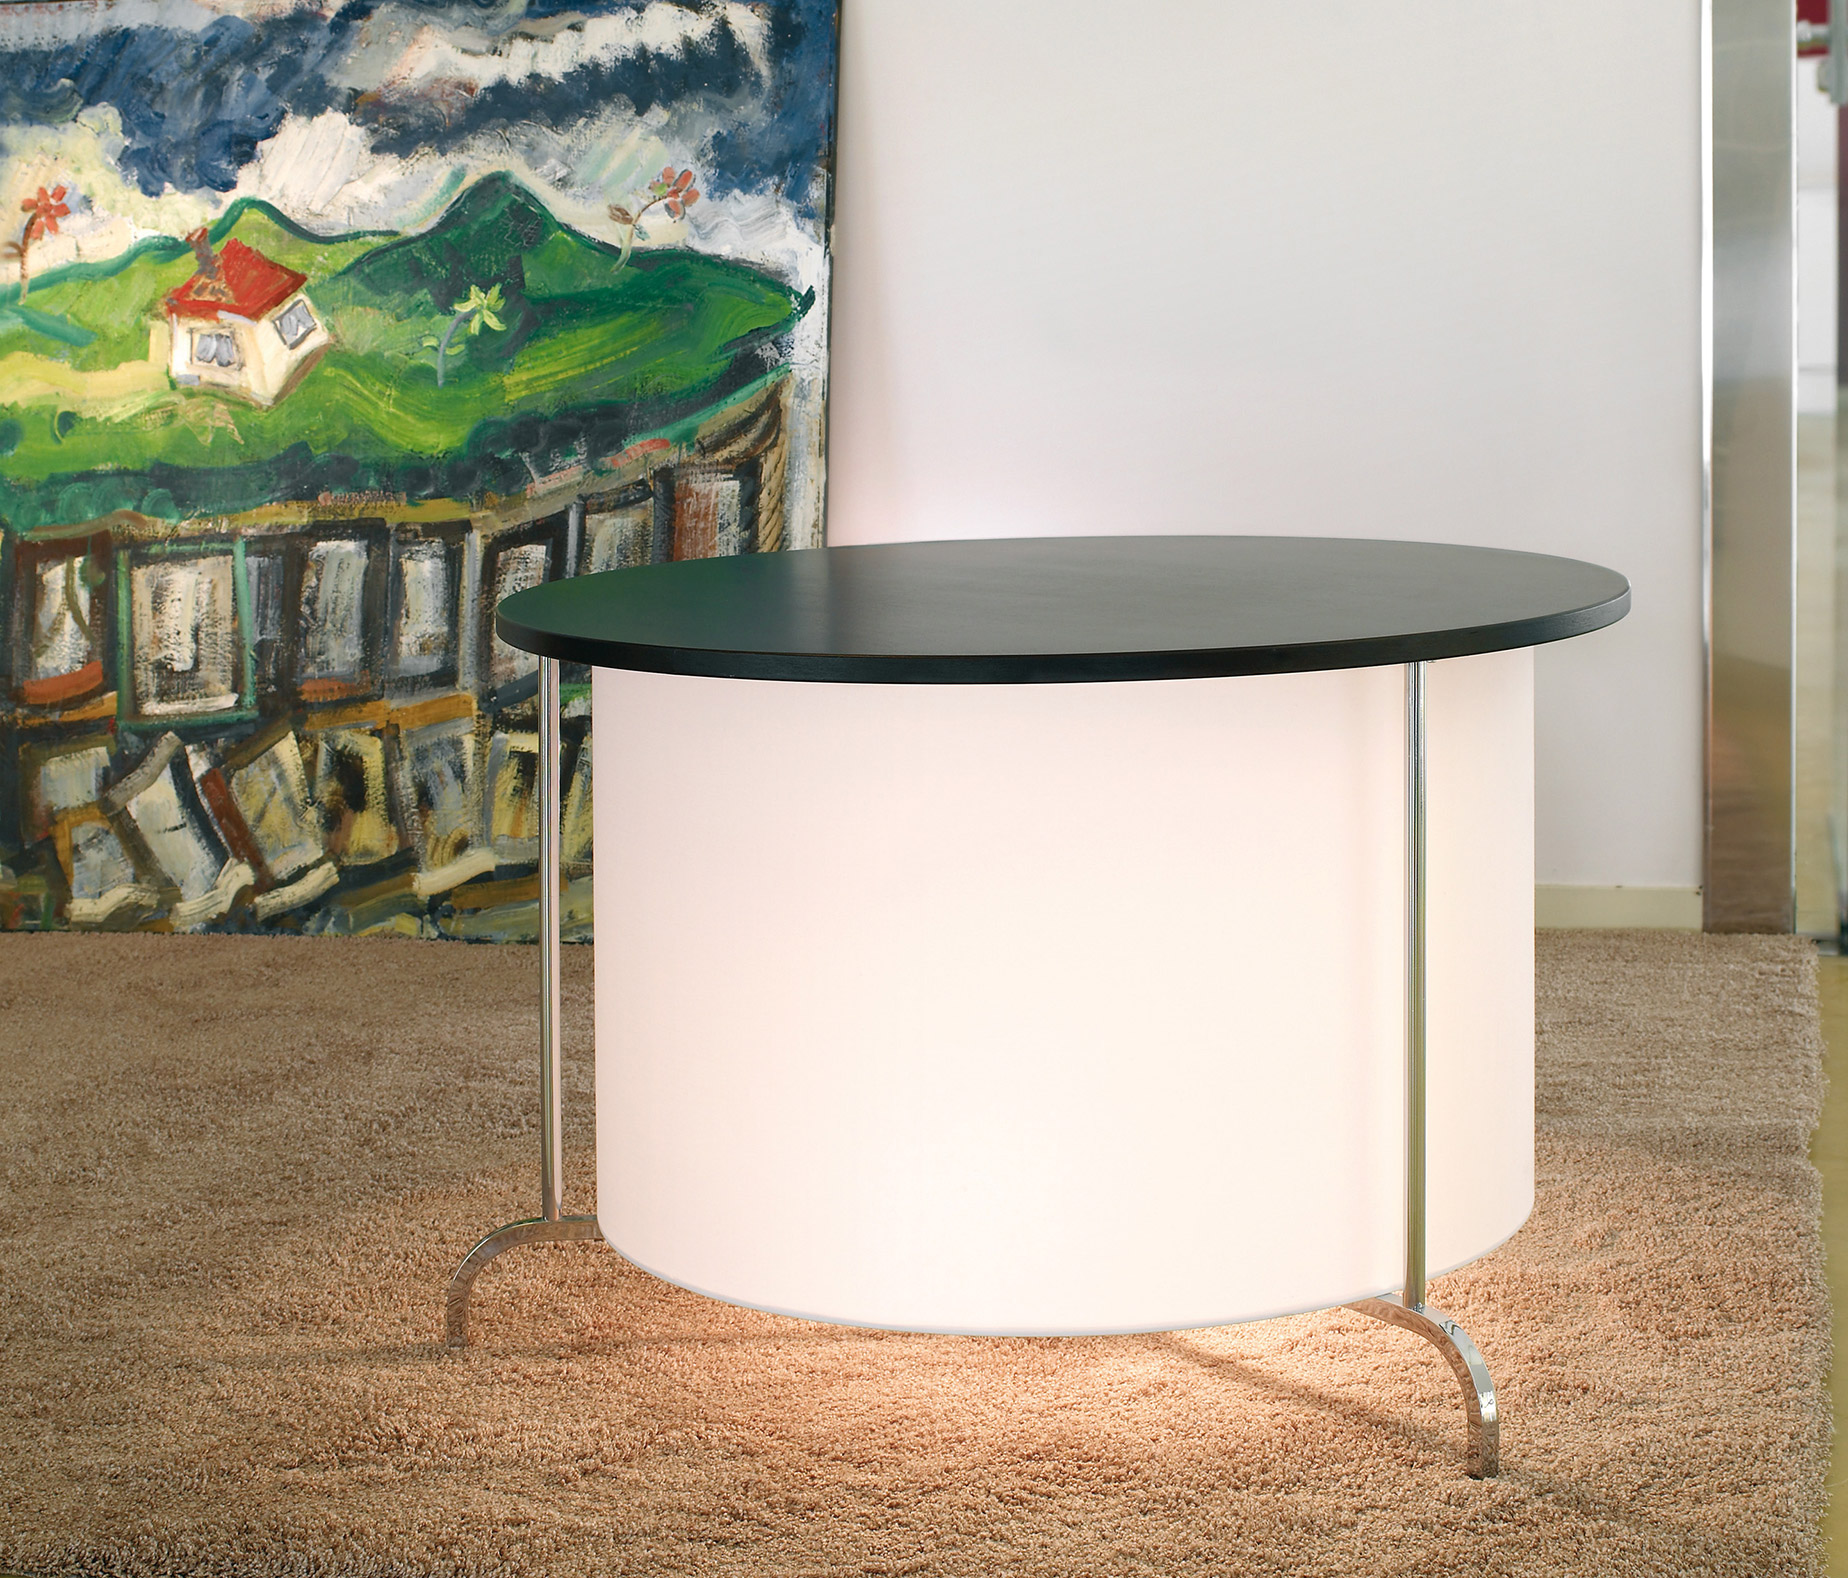 mesa lampara peana fonda europa Bover